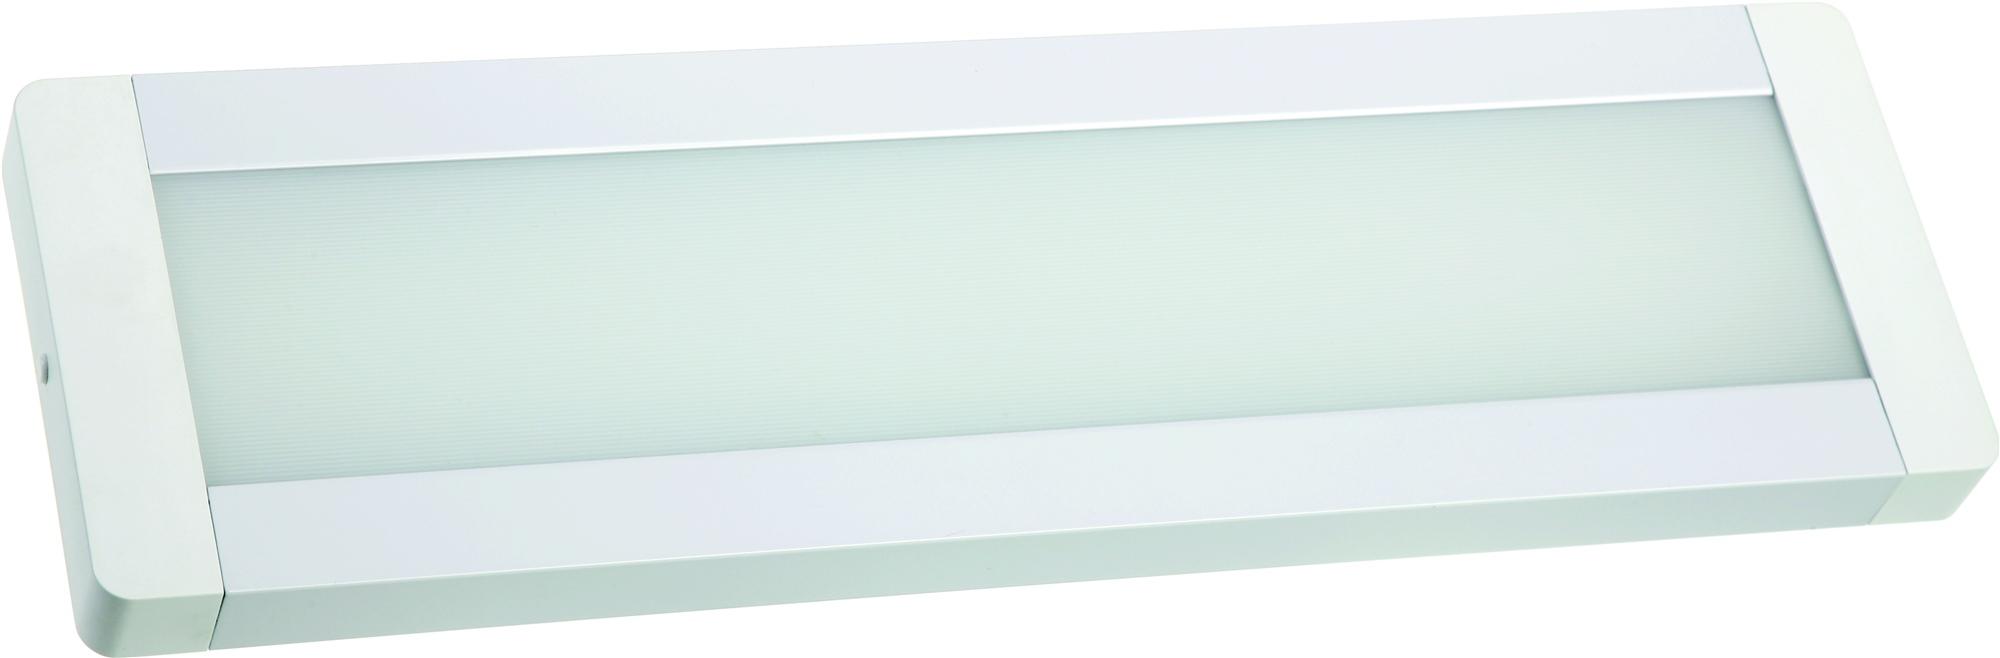 Lampenlux LED Wandlampe Wandleuchte Niri Badlicht grau 25/25W 55/85cm inkl. Trafo